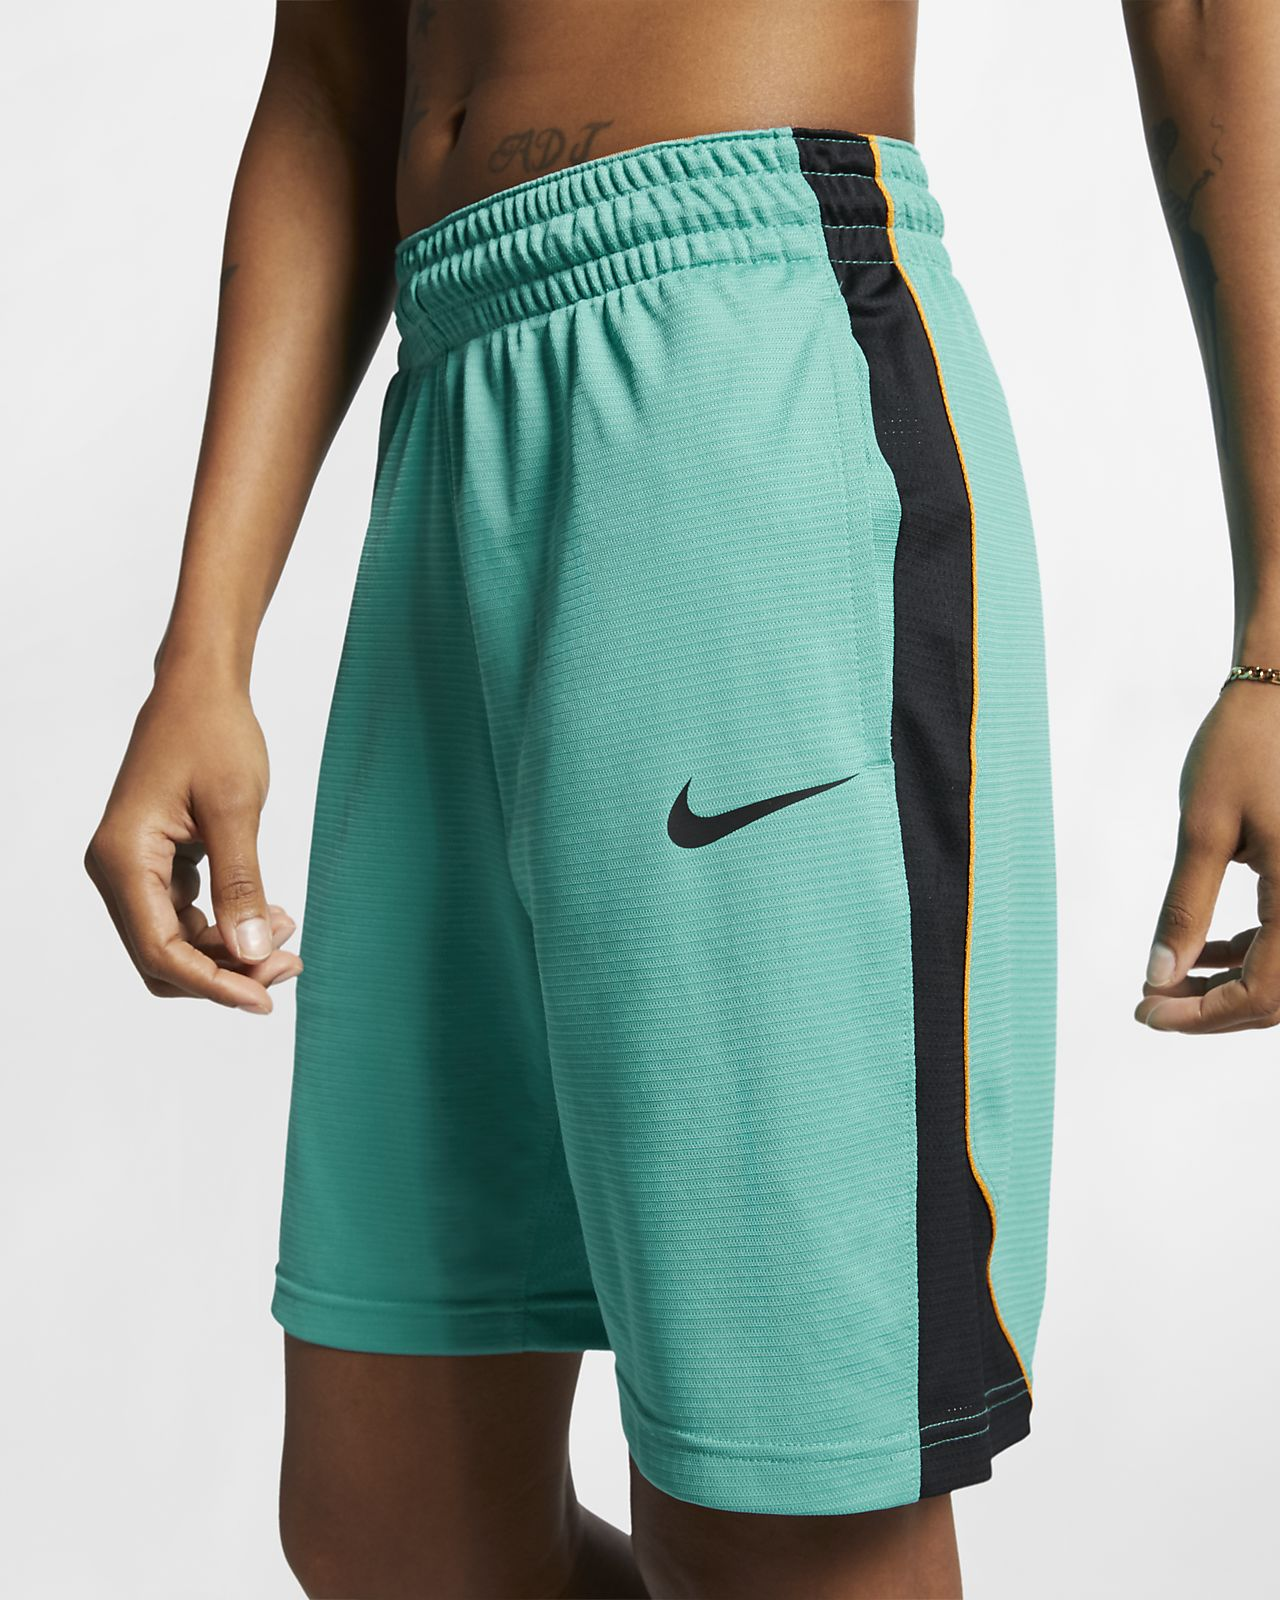 Nike Dry Essential Pantalón corto de baloncesto de 25,5 cm - Mujer